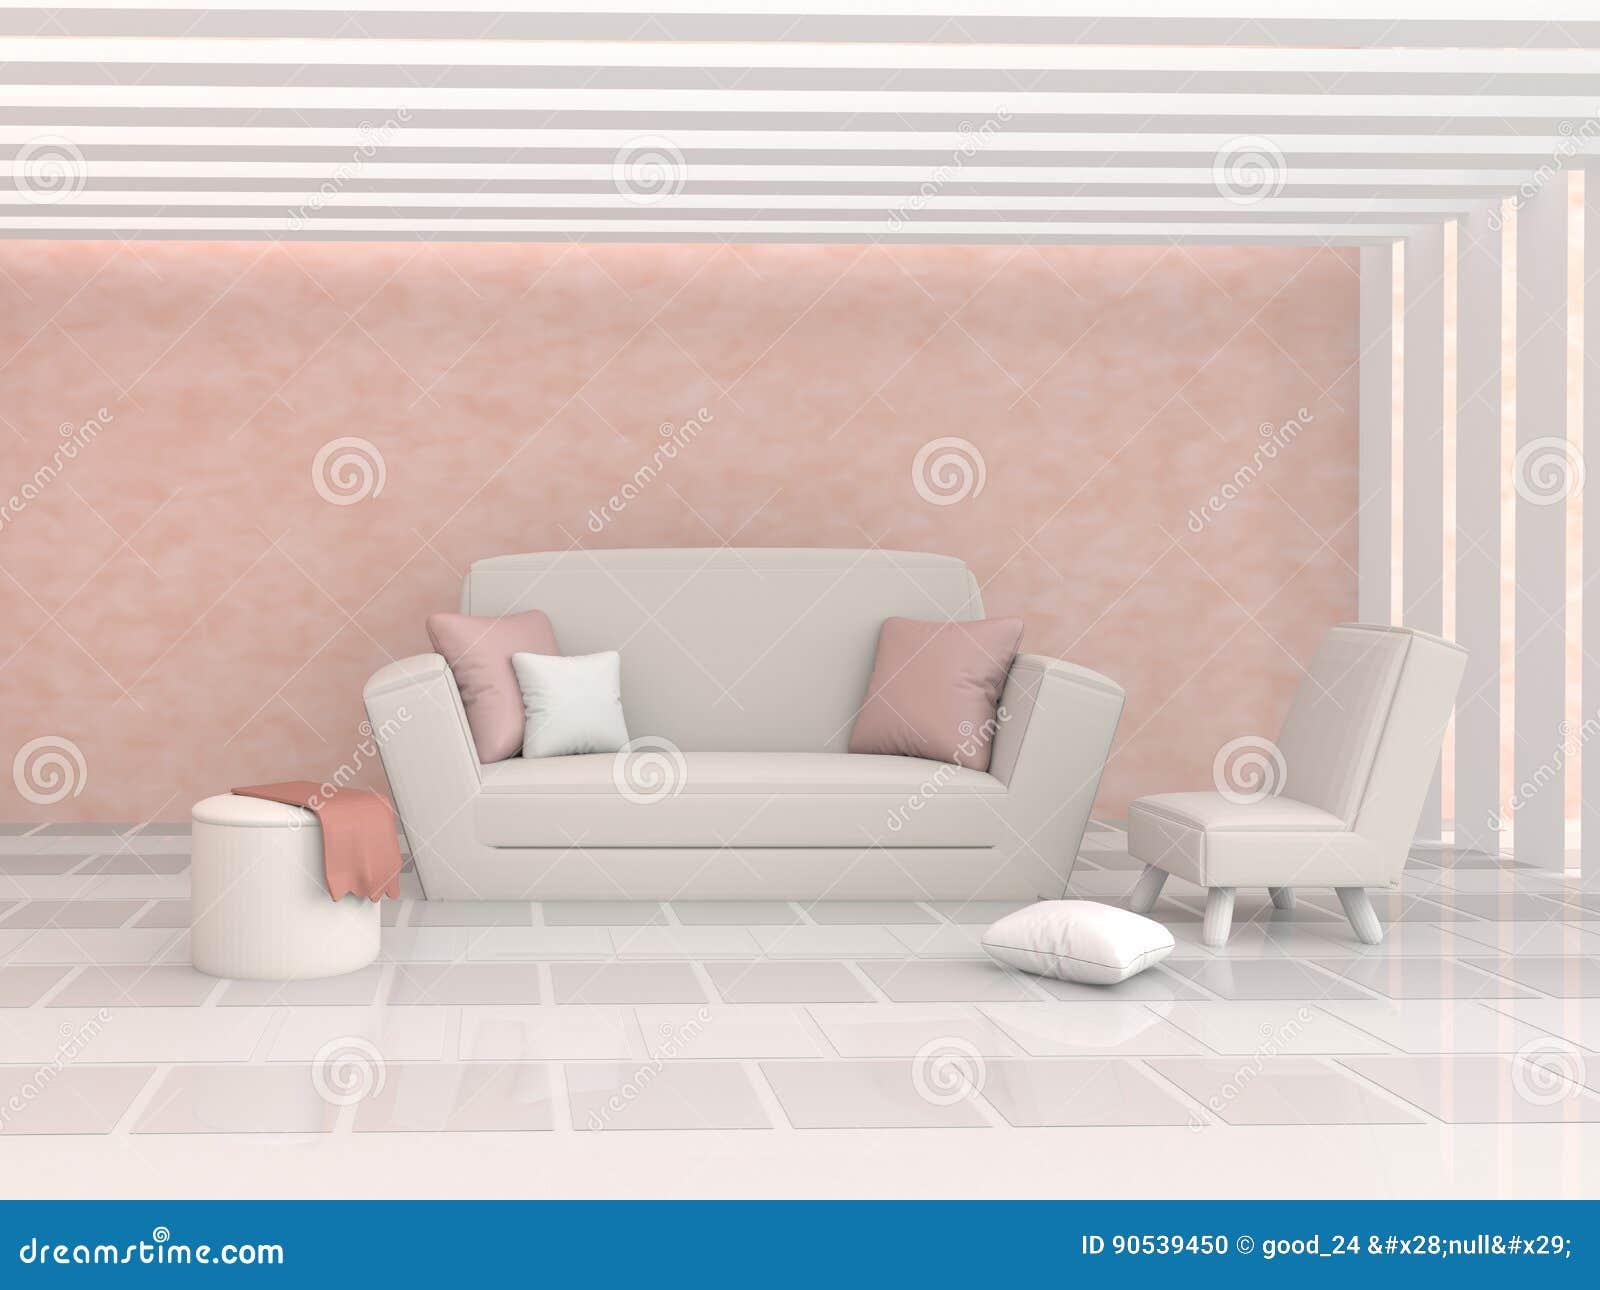 The Living Room In Lovely Day Interior Design